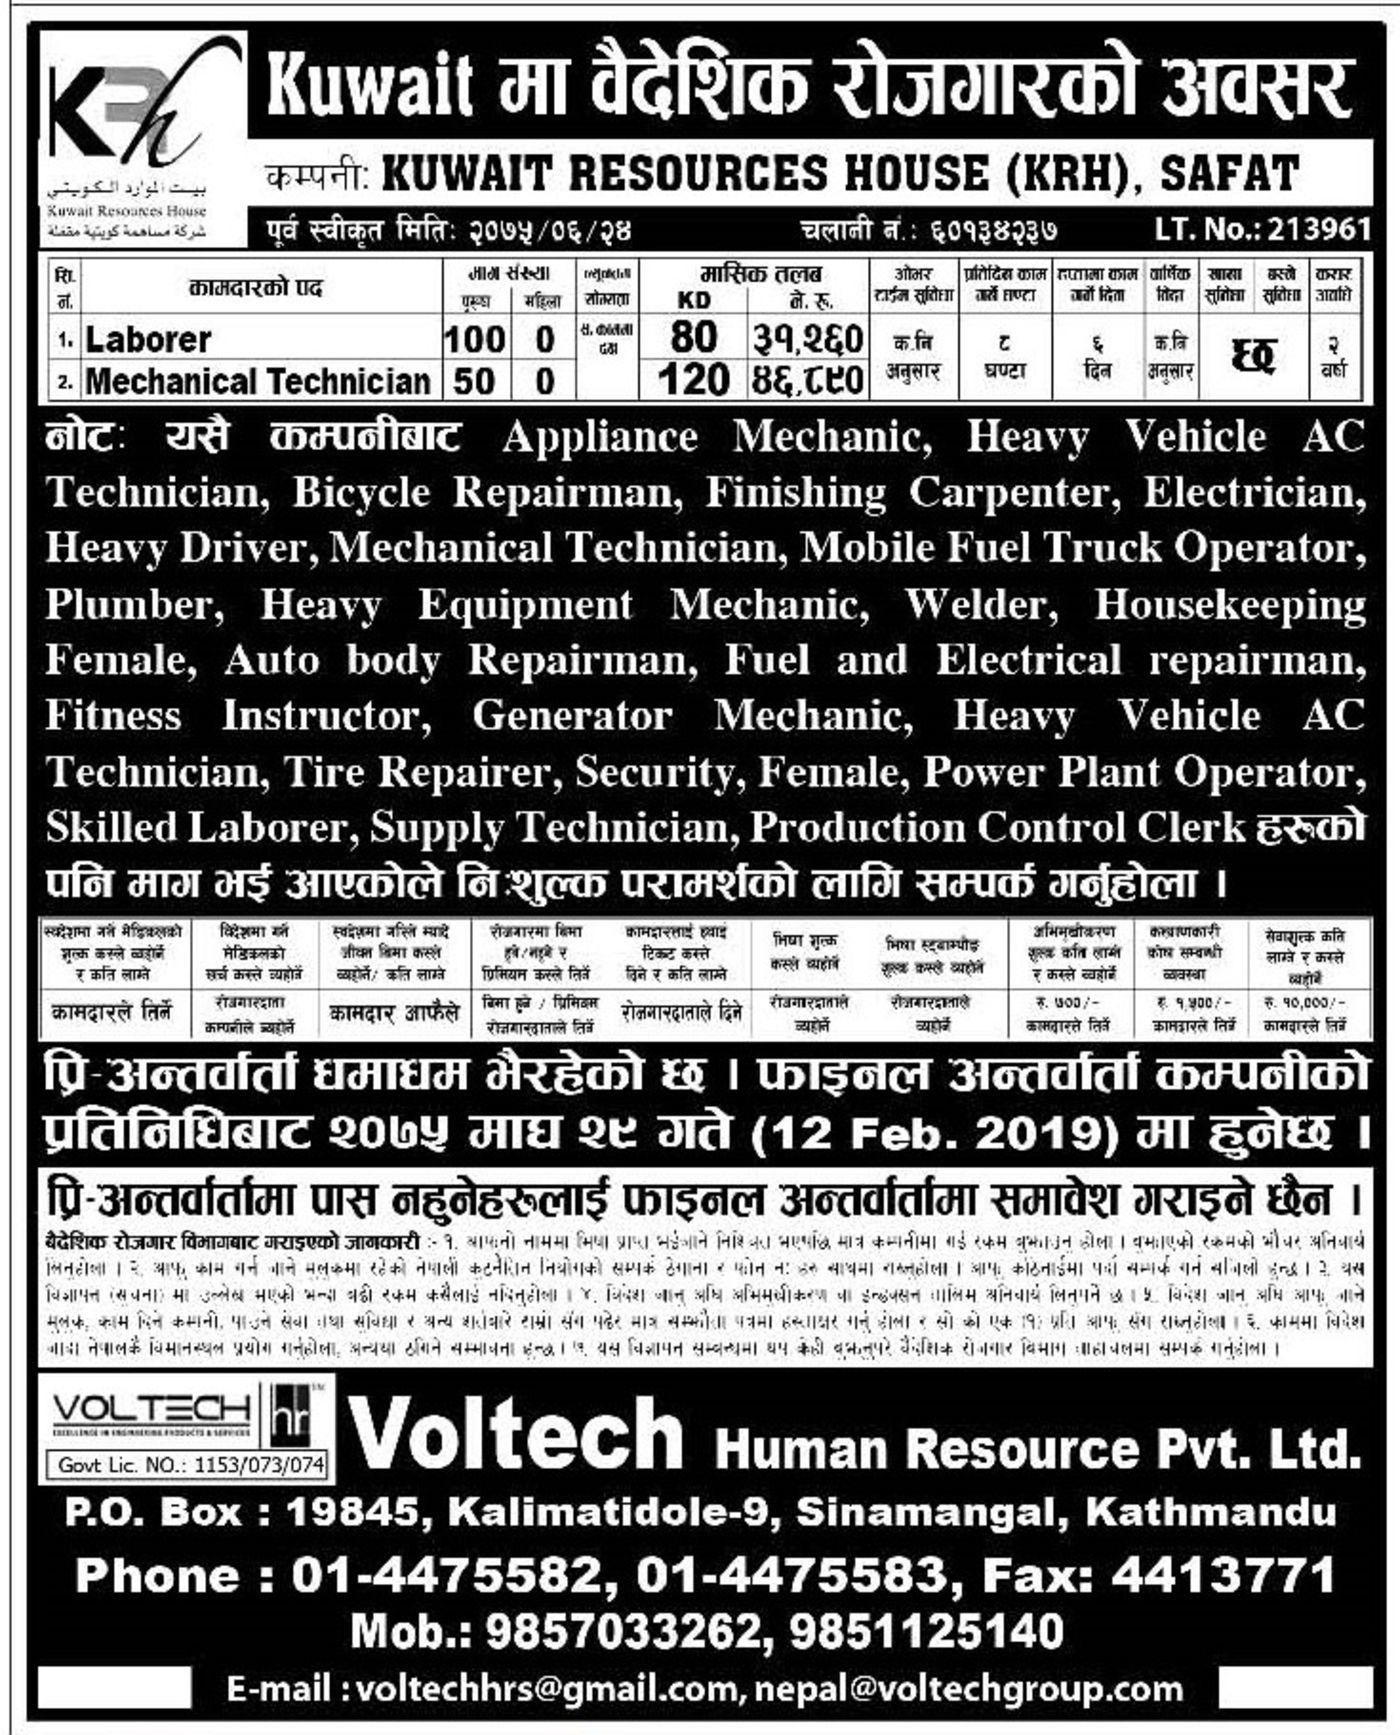 Jobs Nepal - Vacancy - Labor - Kuwait Resources House (KRH